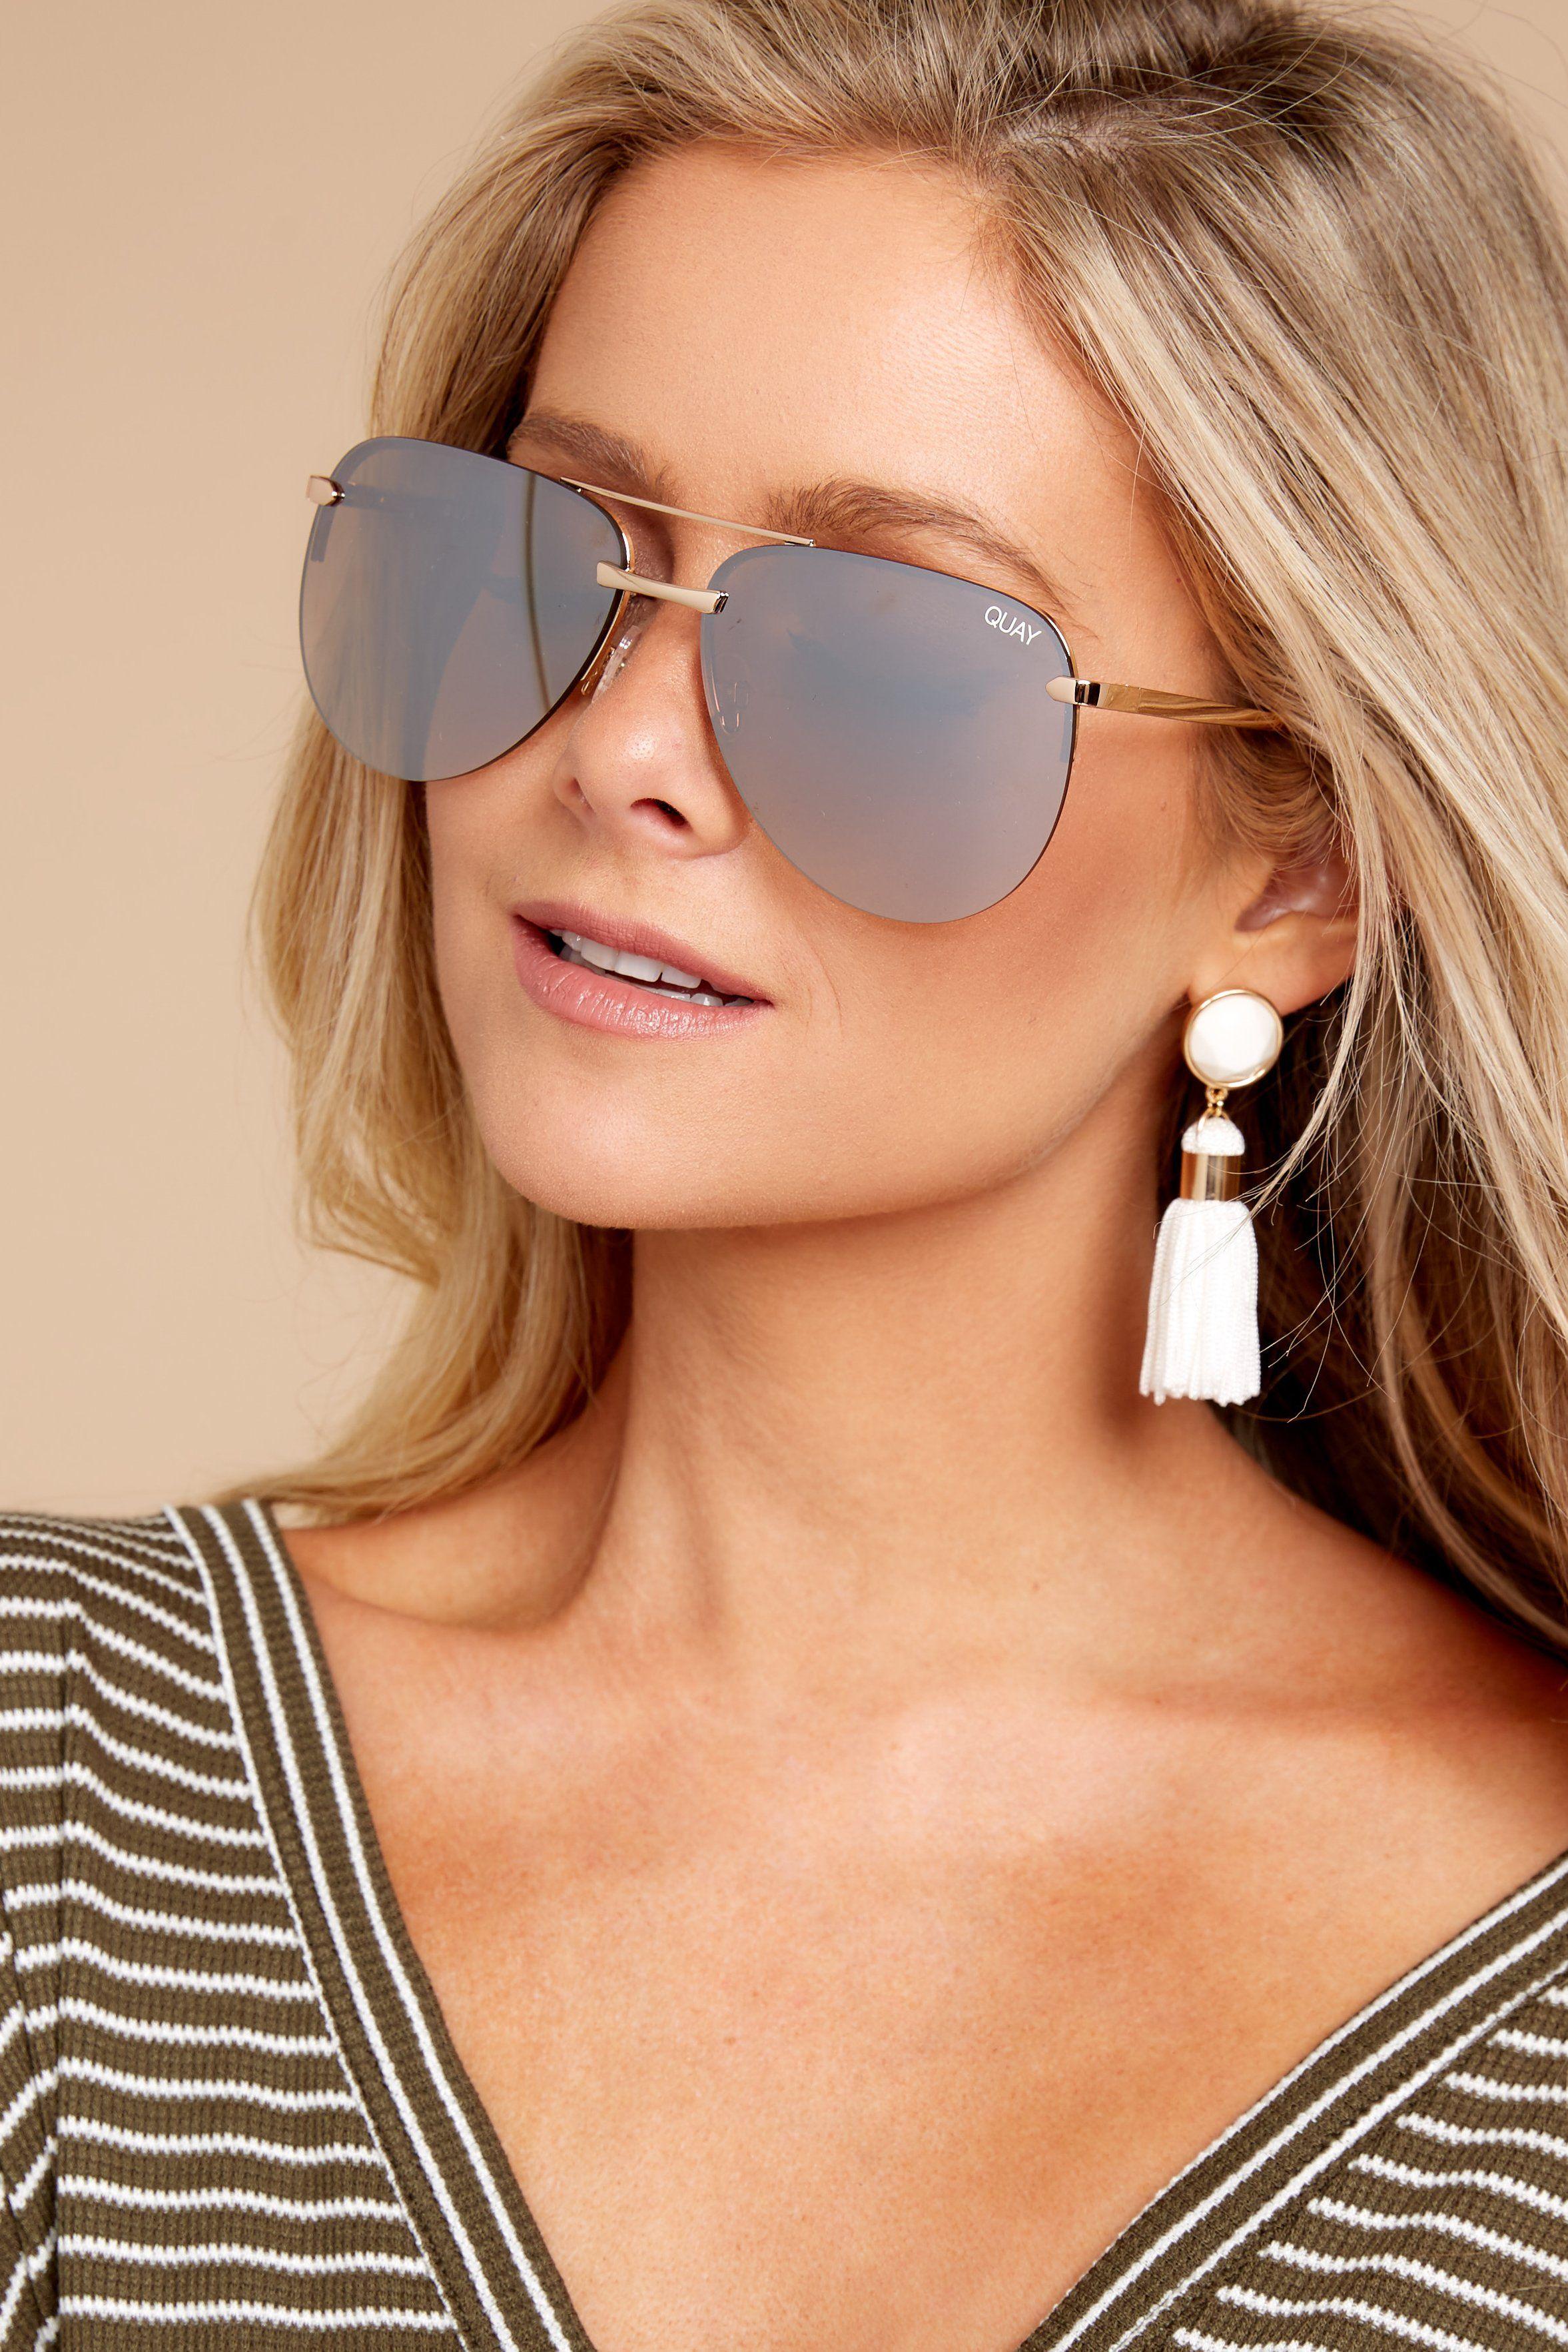 Quay Australia Playa Gold Brown Sunglasses Chic Sunglasses Sunglasses 60 00 Red Dress Boutique Sunglasses Brown Sunglasses Fashion Eye Glasses